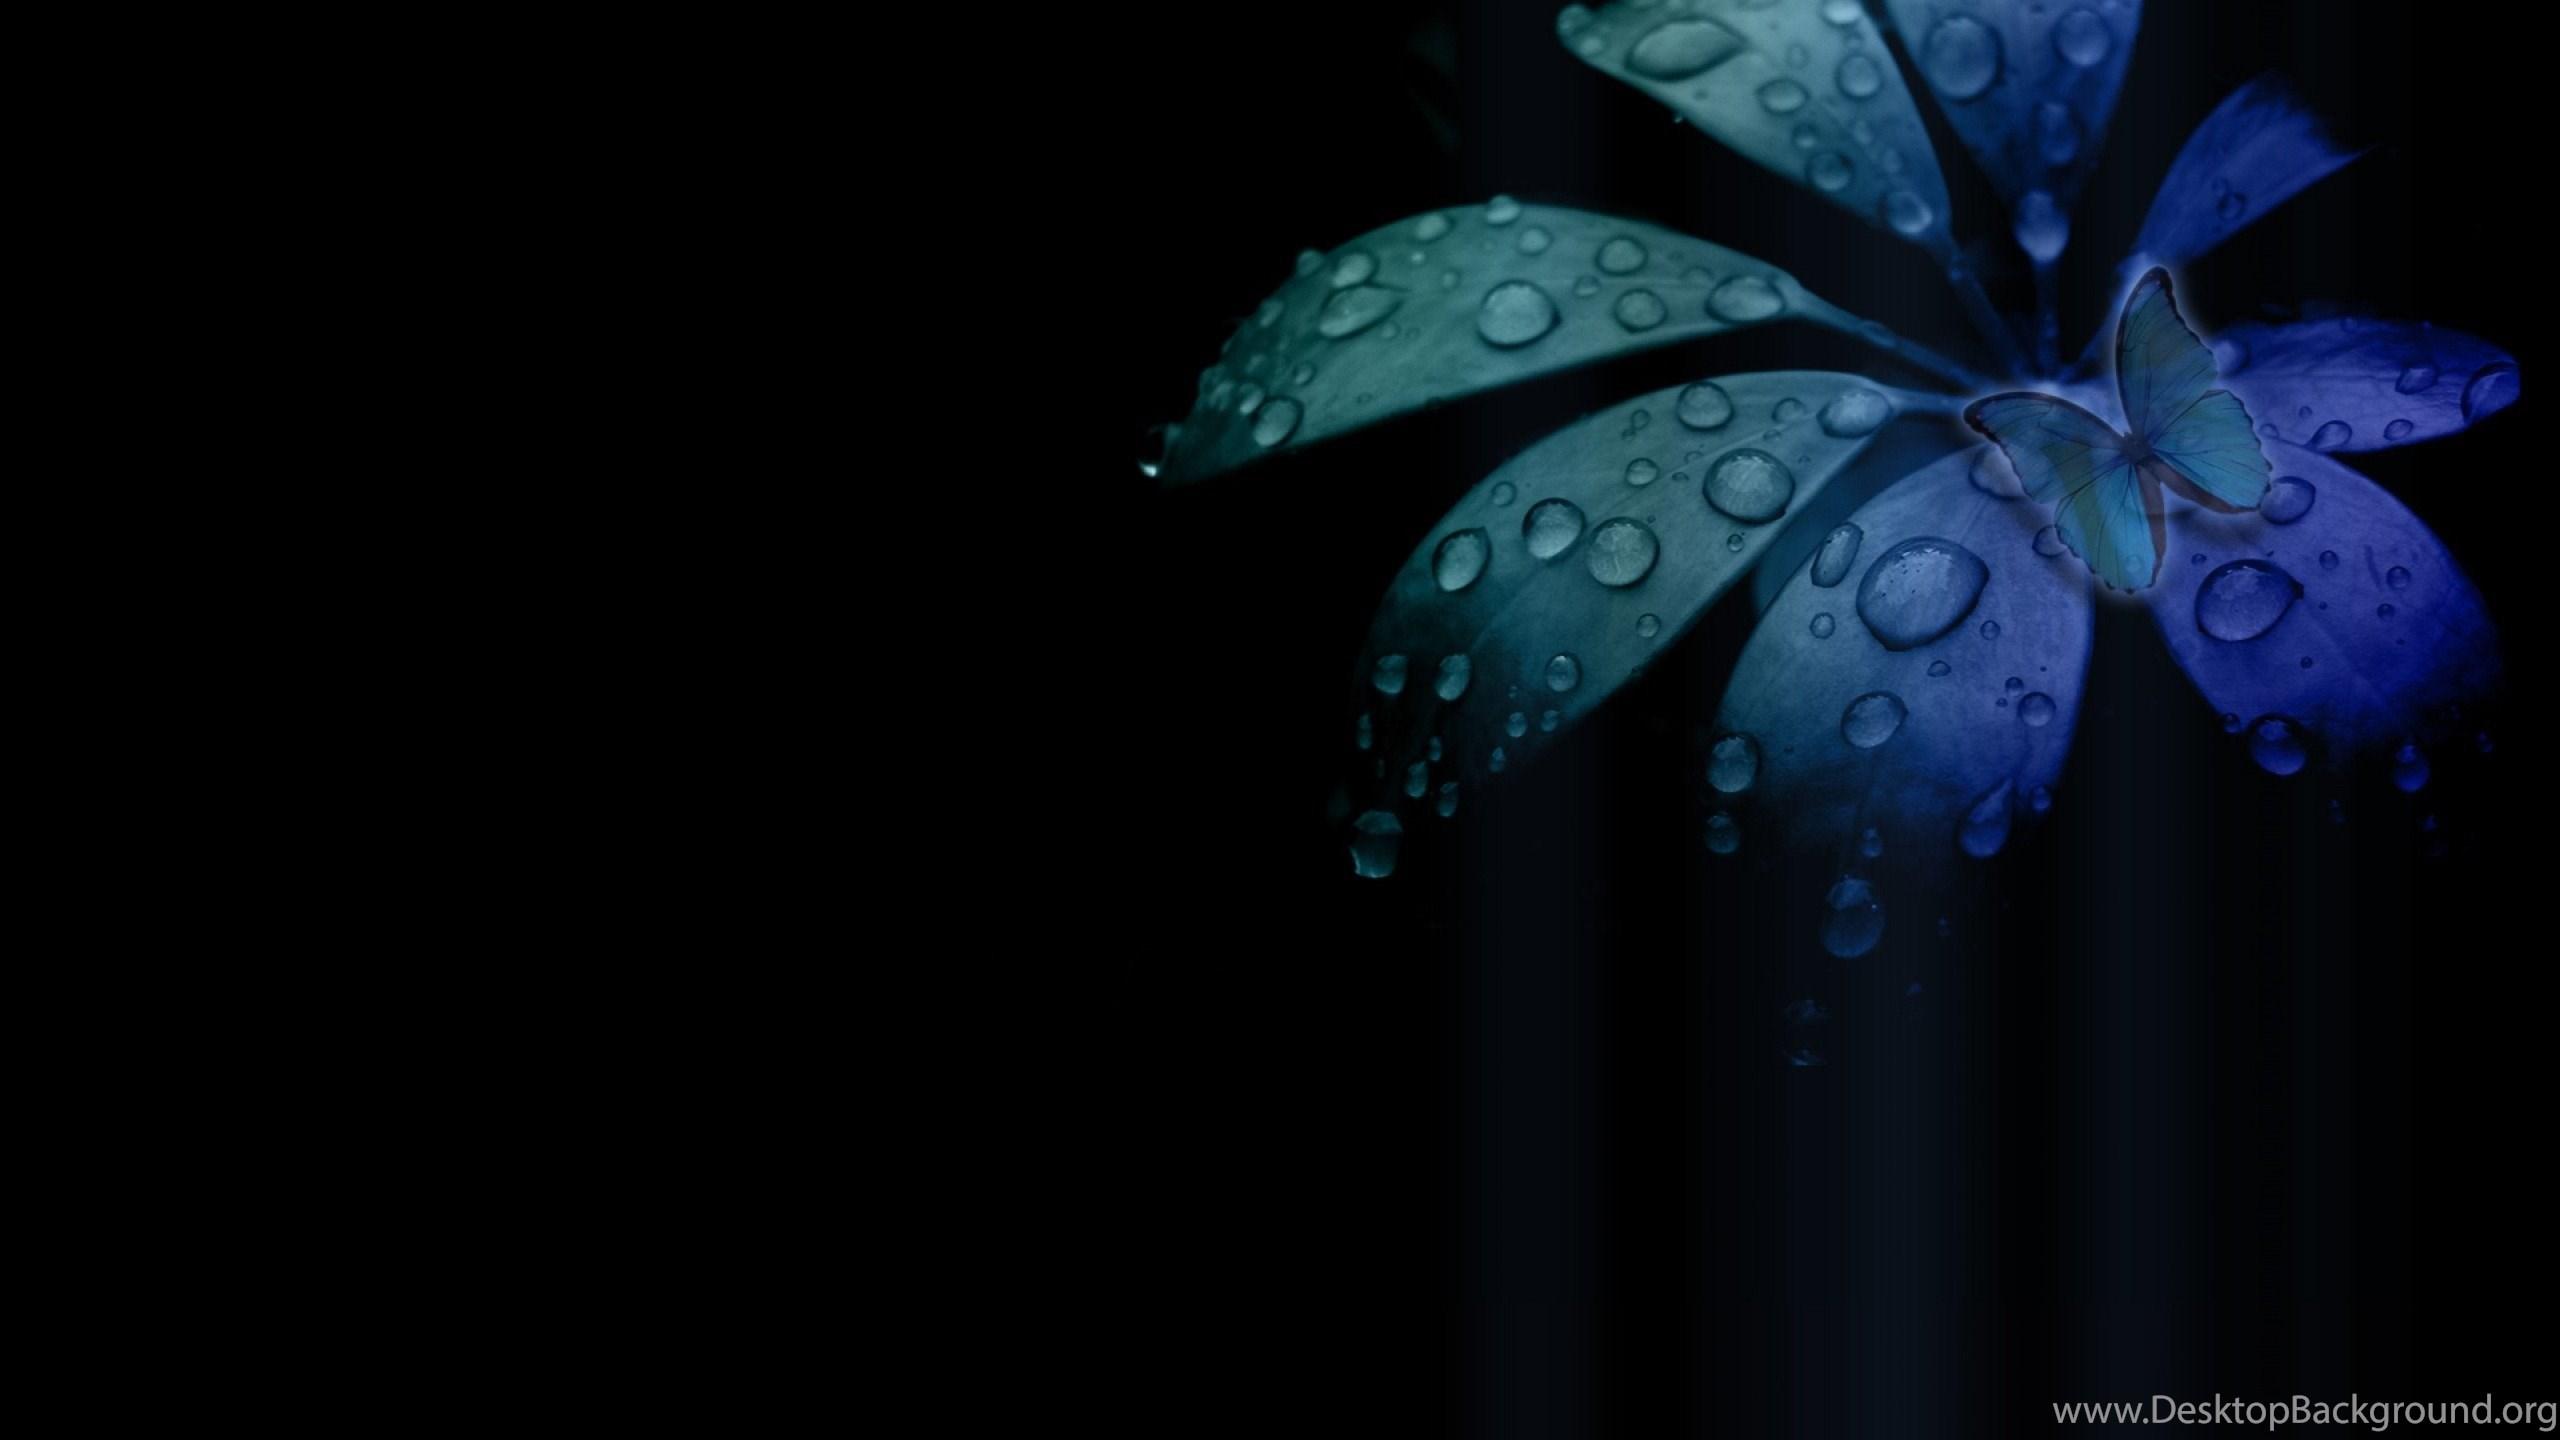 High Resolution Black Flower Desktop Wallpapers Hd 3 Full Size Desktop Background